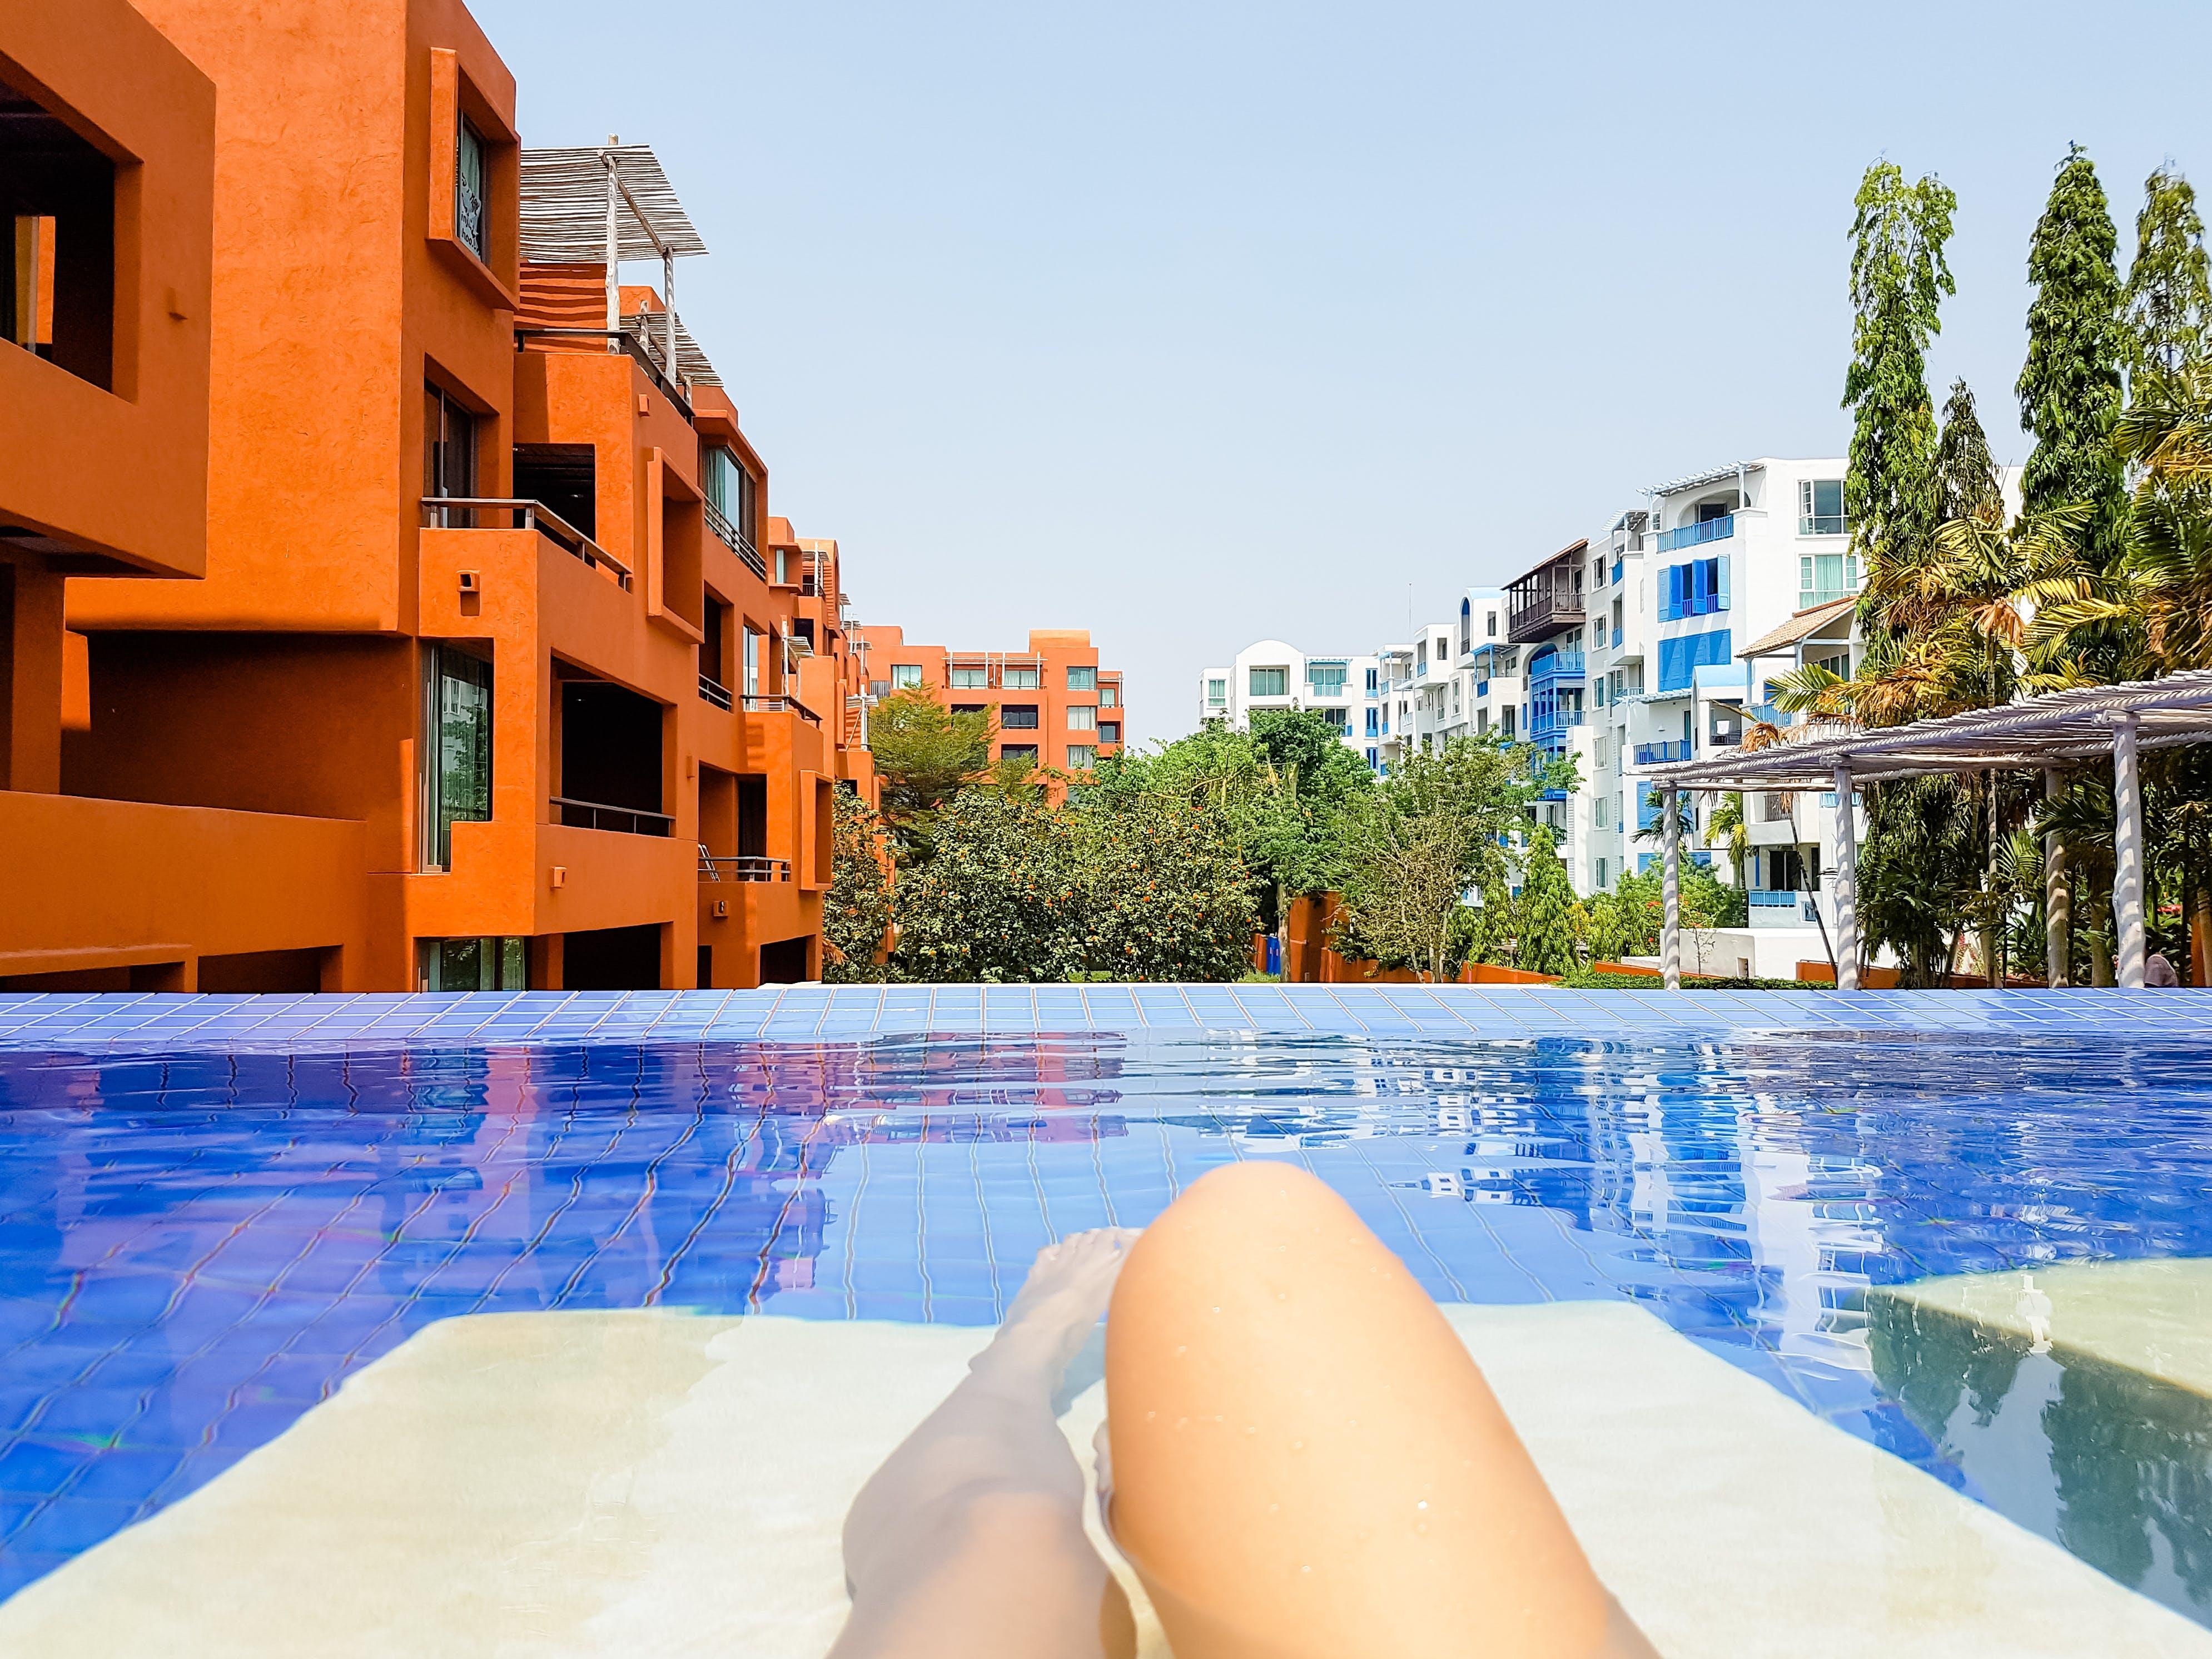 Swimming Pool Beside Orange Building